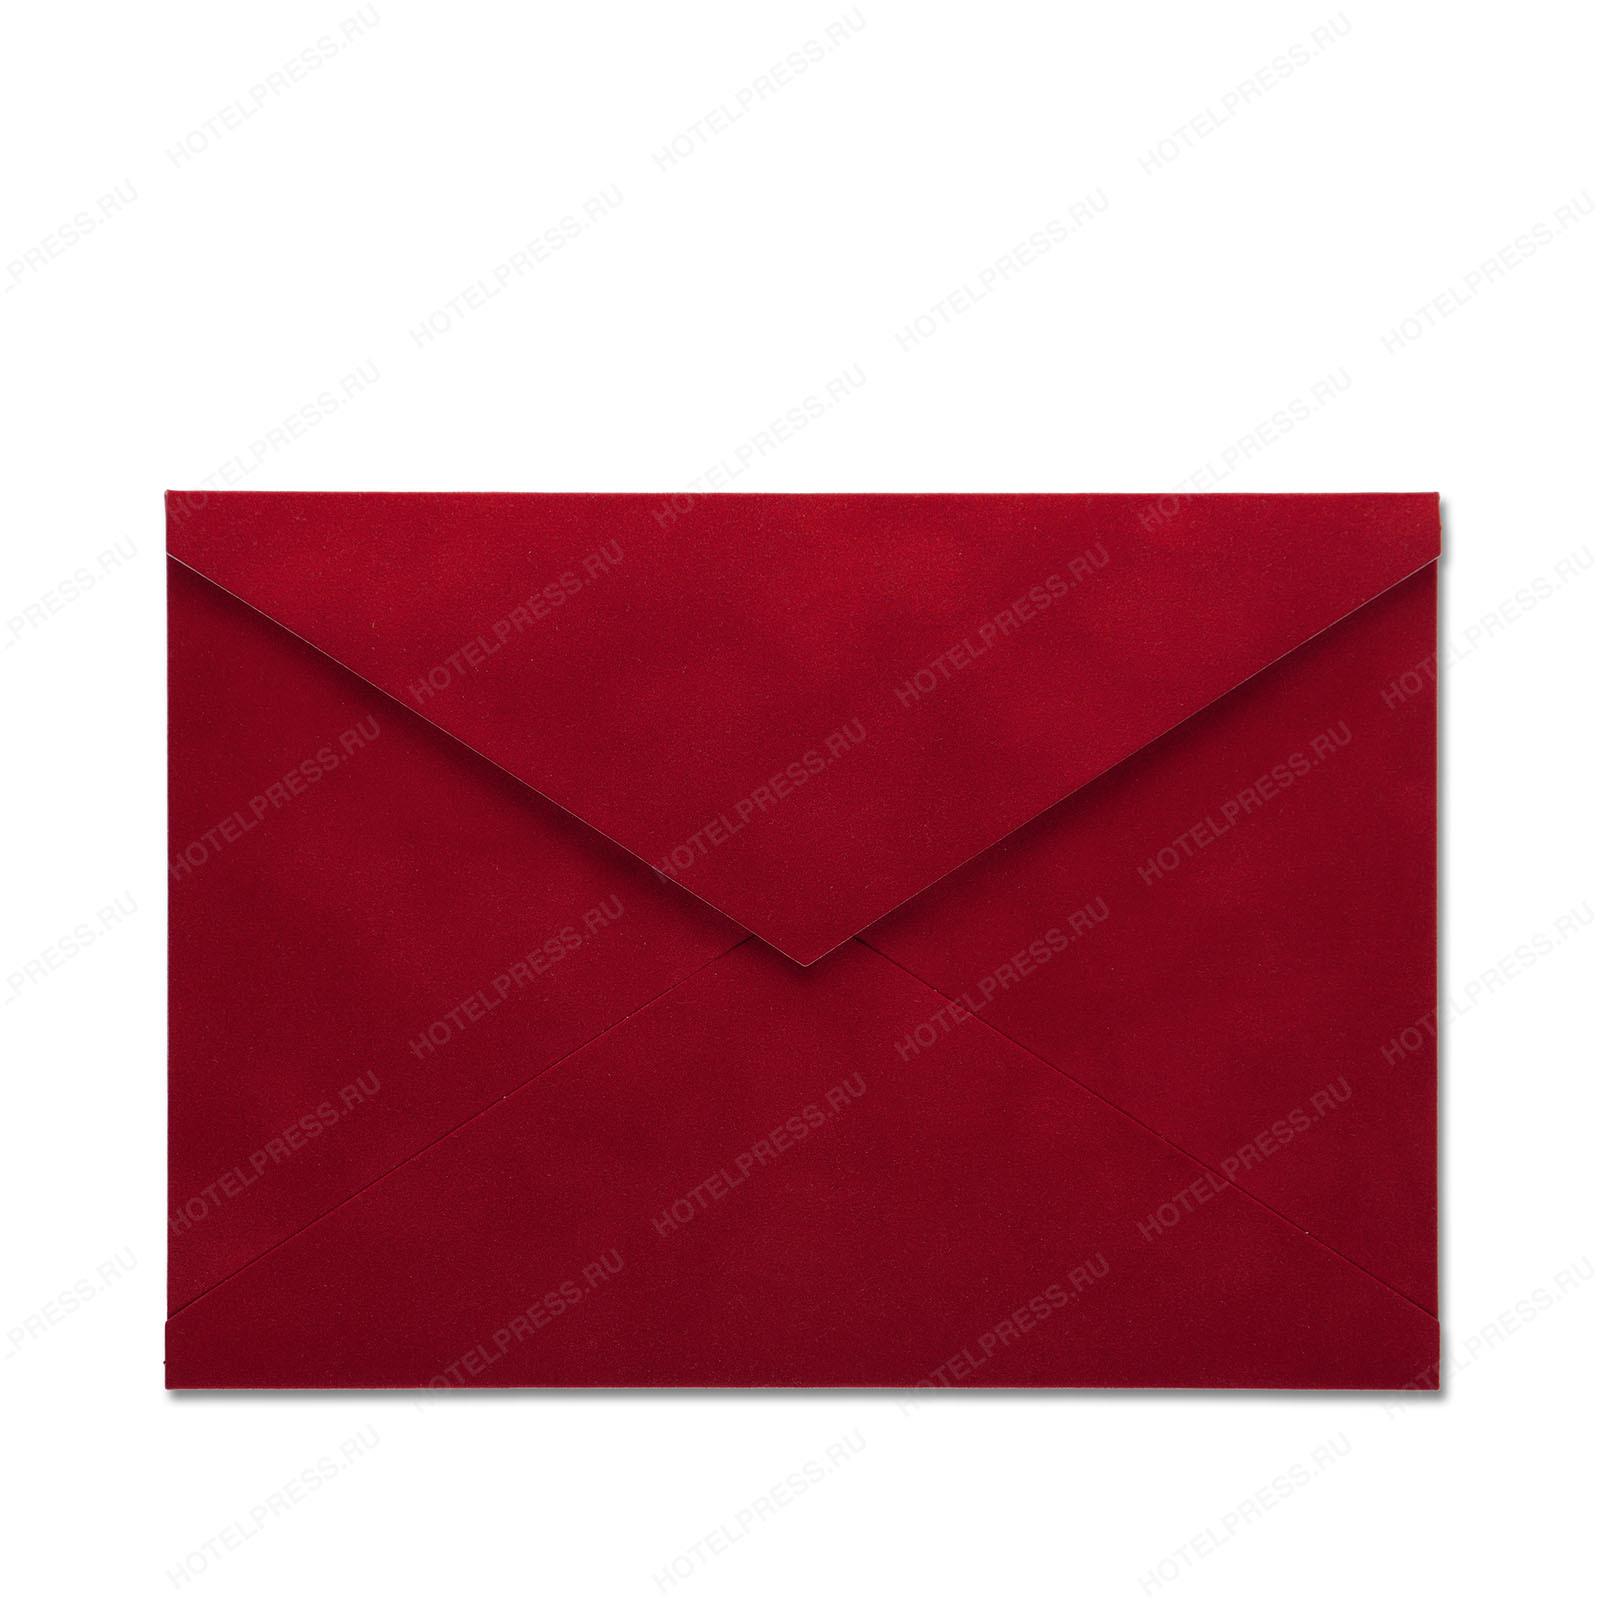 Цветные бархатные конверты на заказ